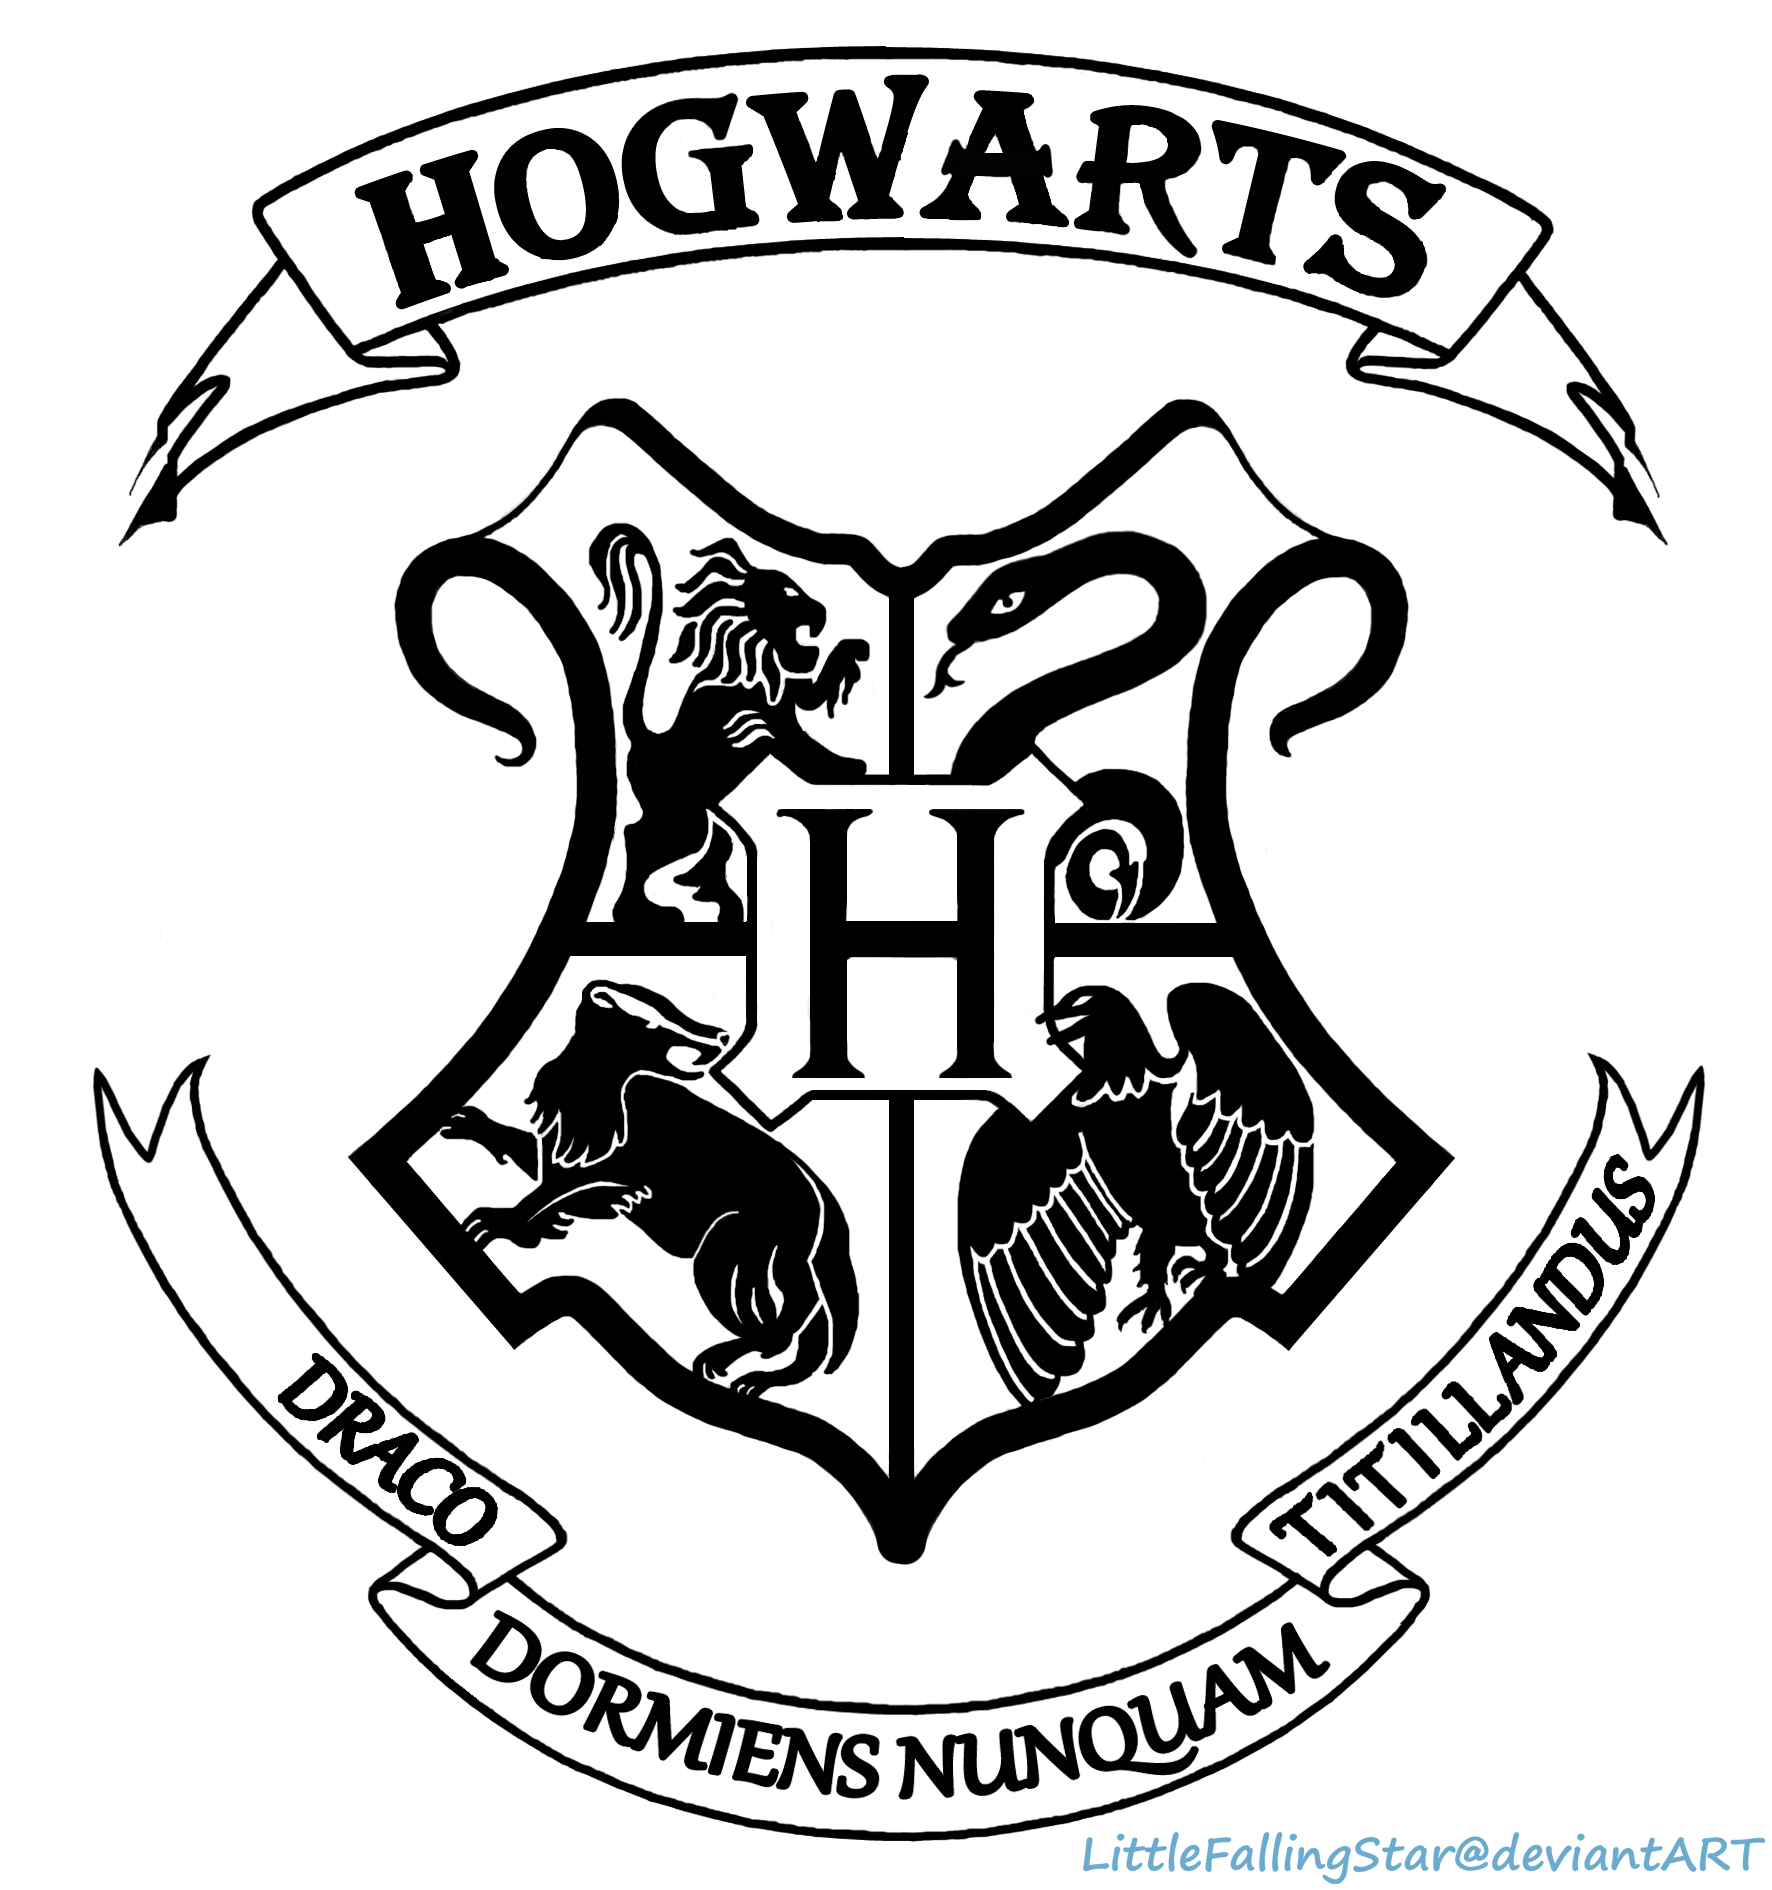 Hogwarts Crest By Littlefallingstar On Deviantart Logo De Hogwarts Silueta De Harry Potter Escudo De Hogwarts